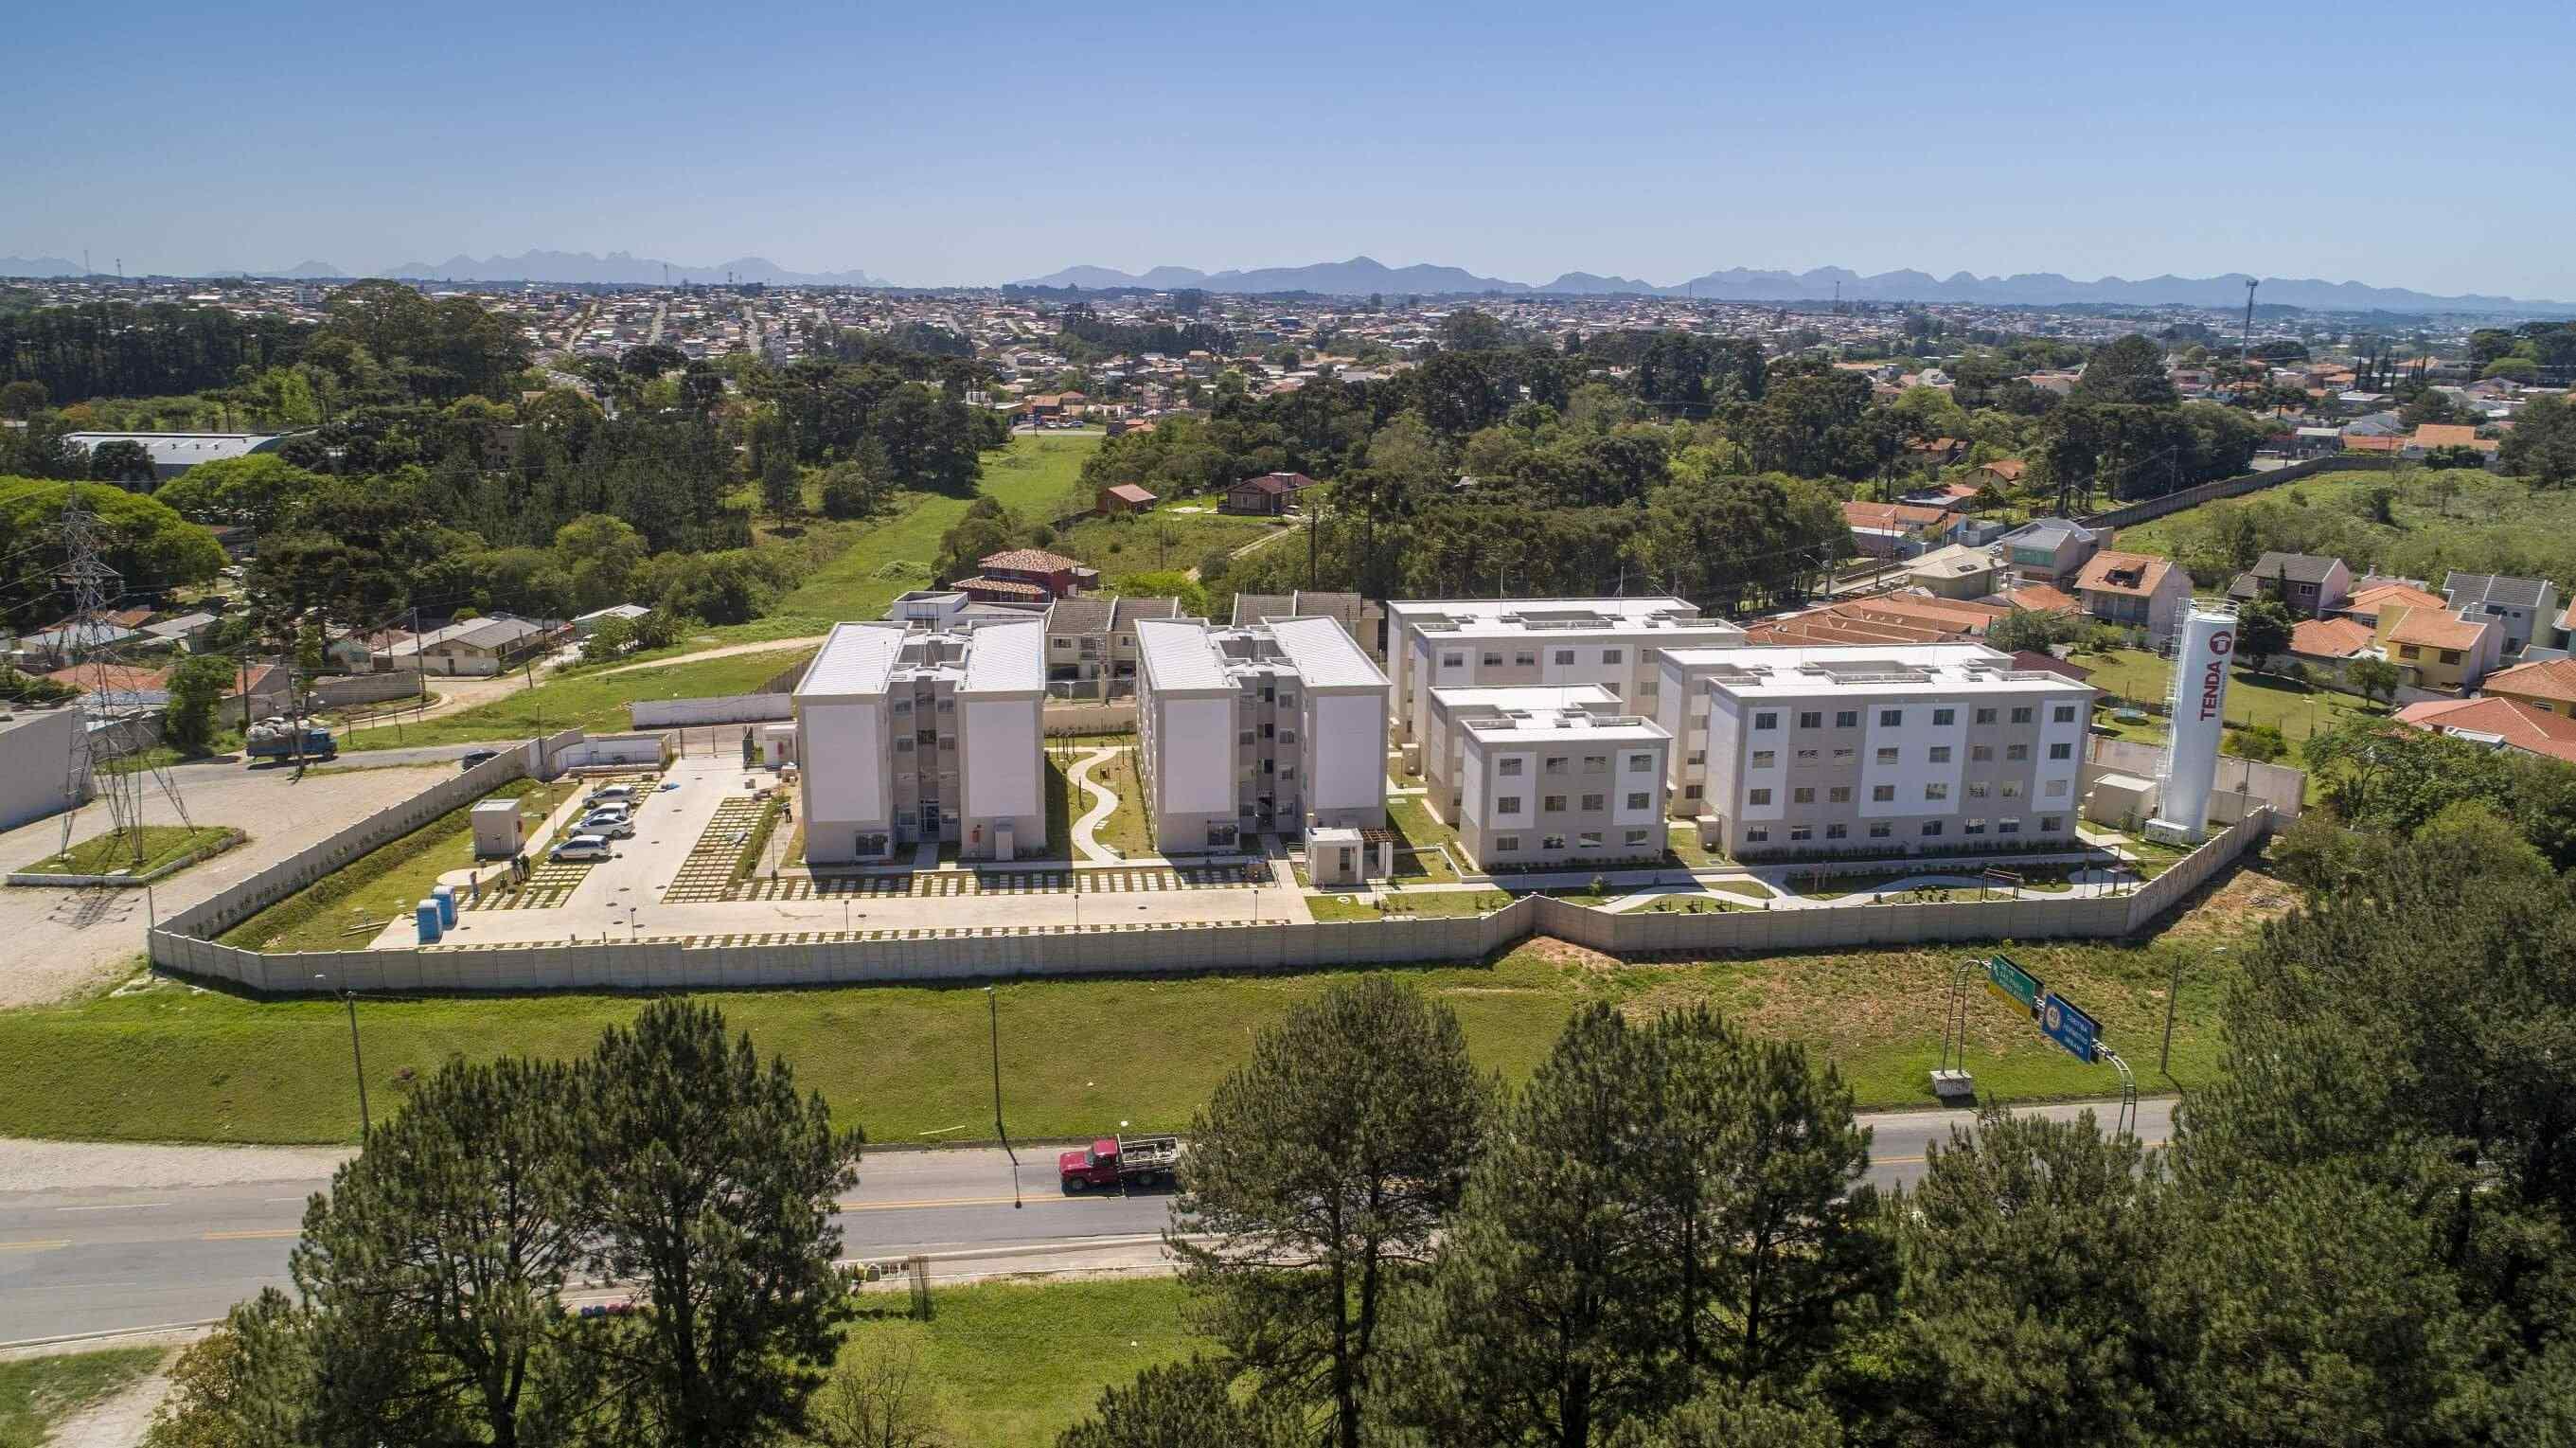 Fotos de obras no empreendimento Ville Provence | Curitiba | PR | foto 1 | tenda.com